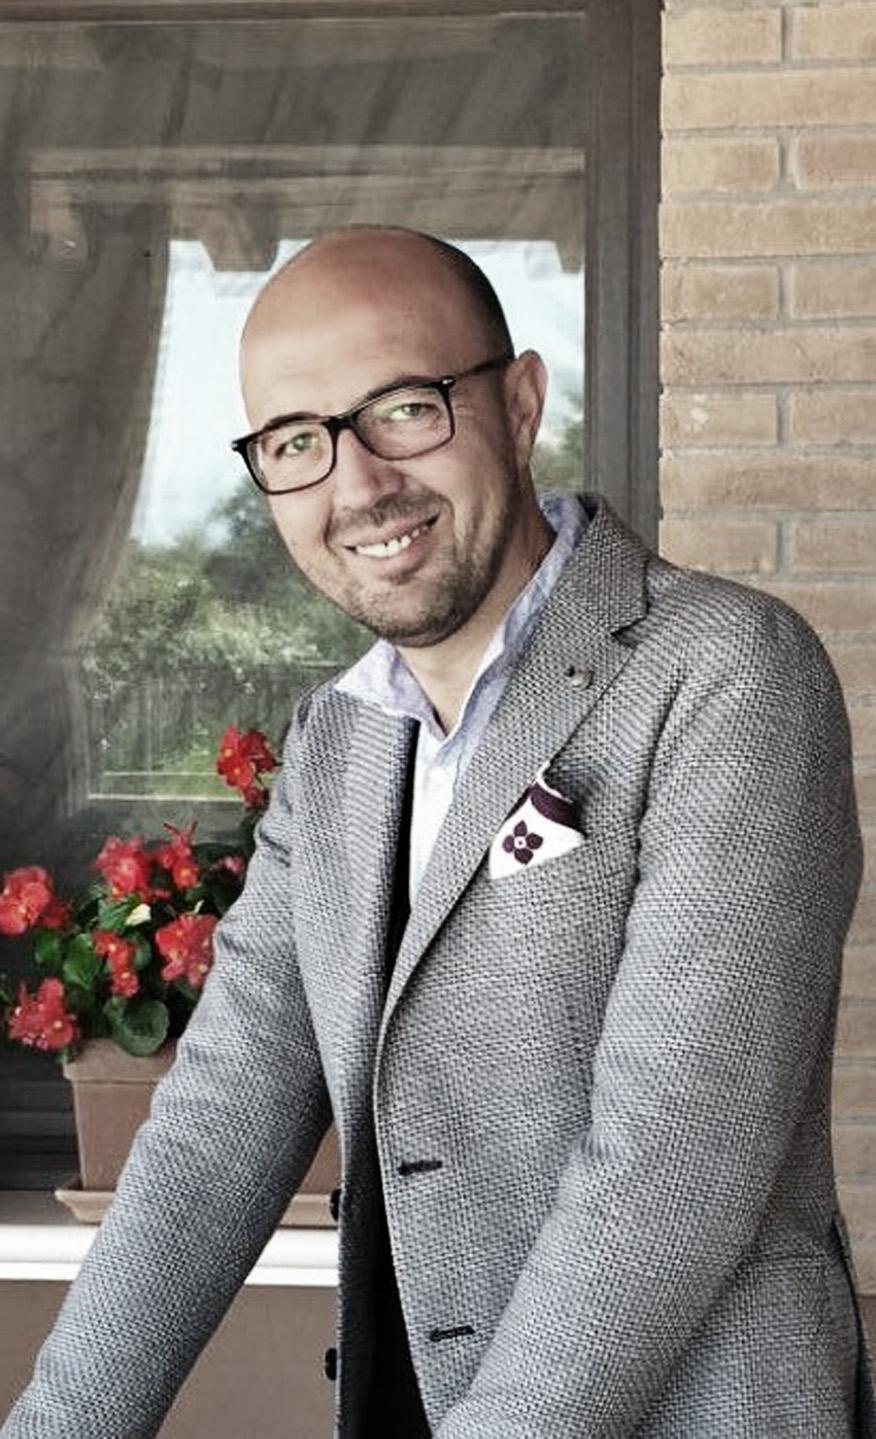 Luca DI Vincenzo